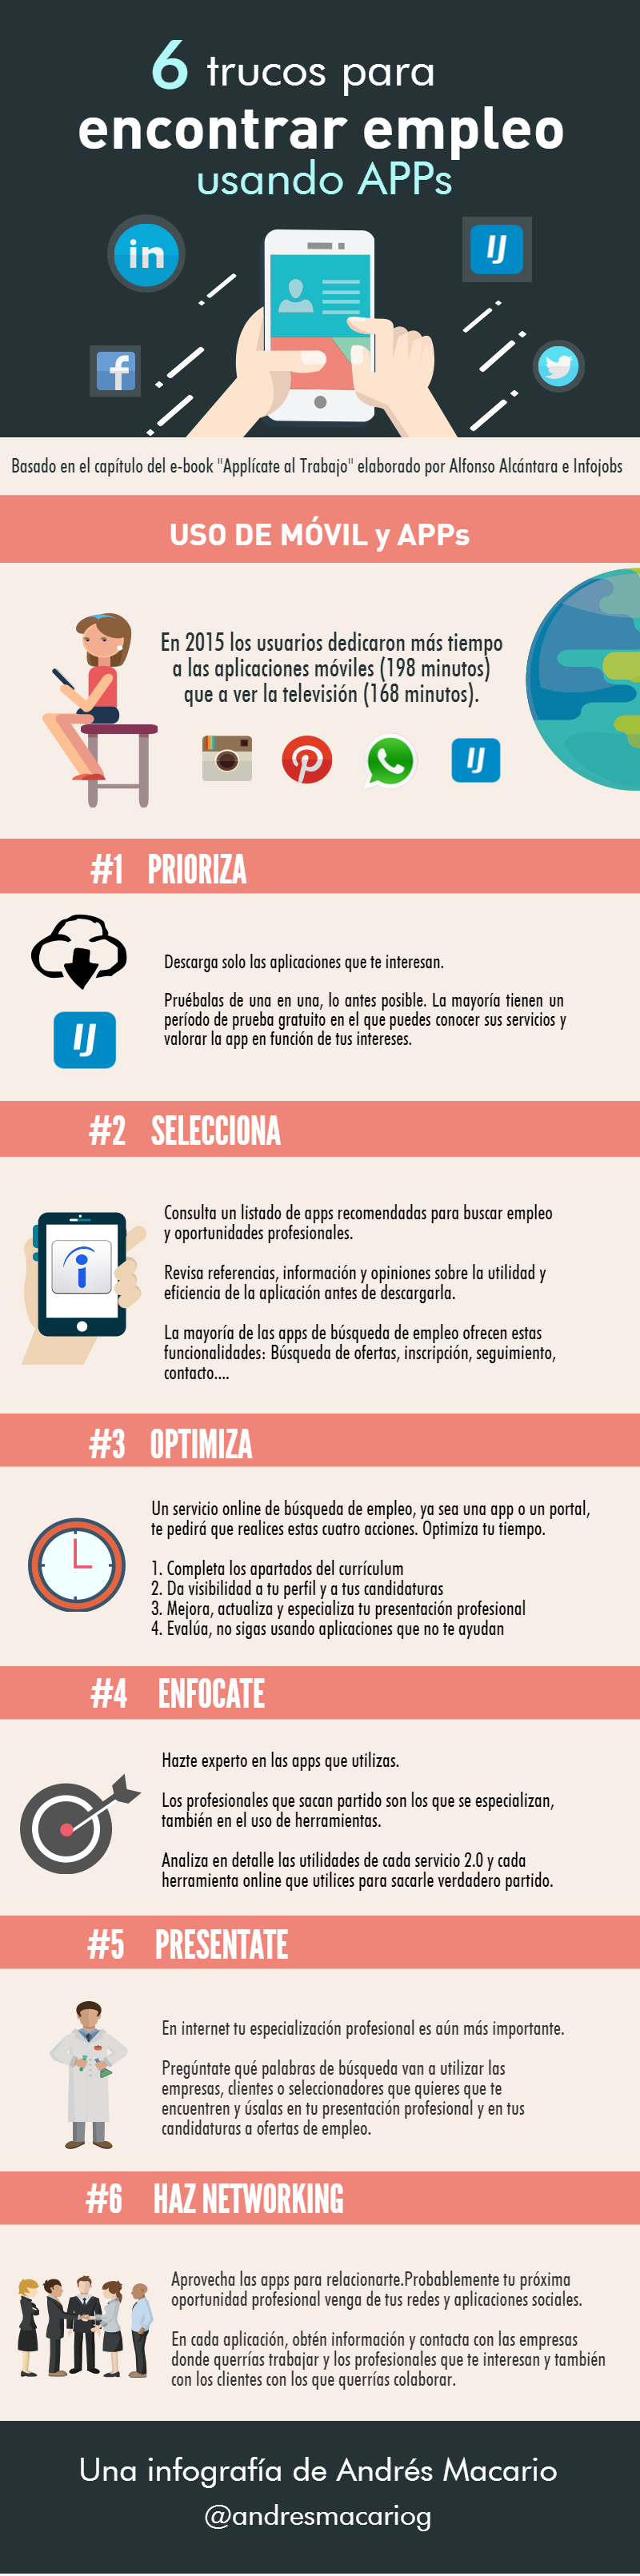 6 trucos para encontrar empleo con apps - Infografia Andres Macario